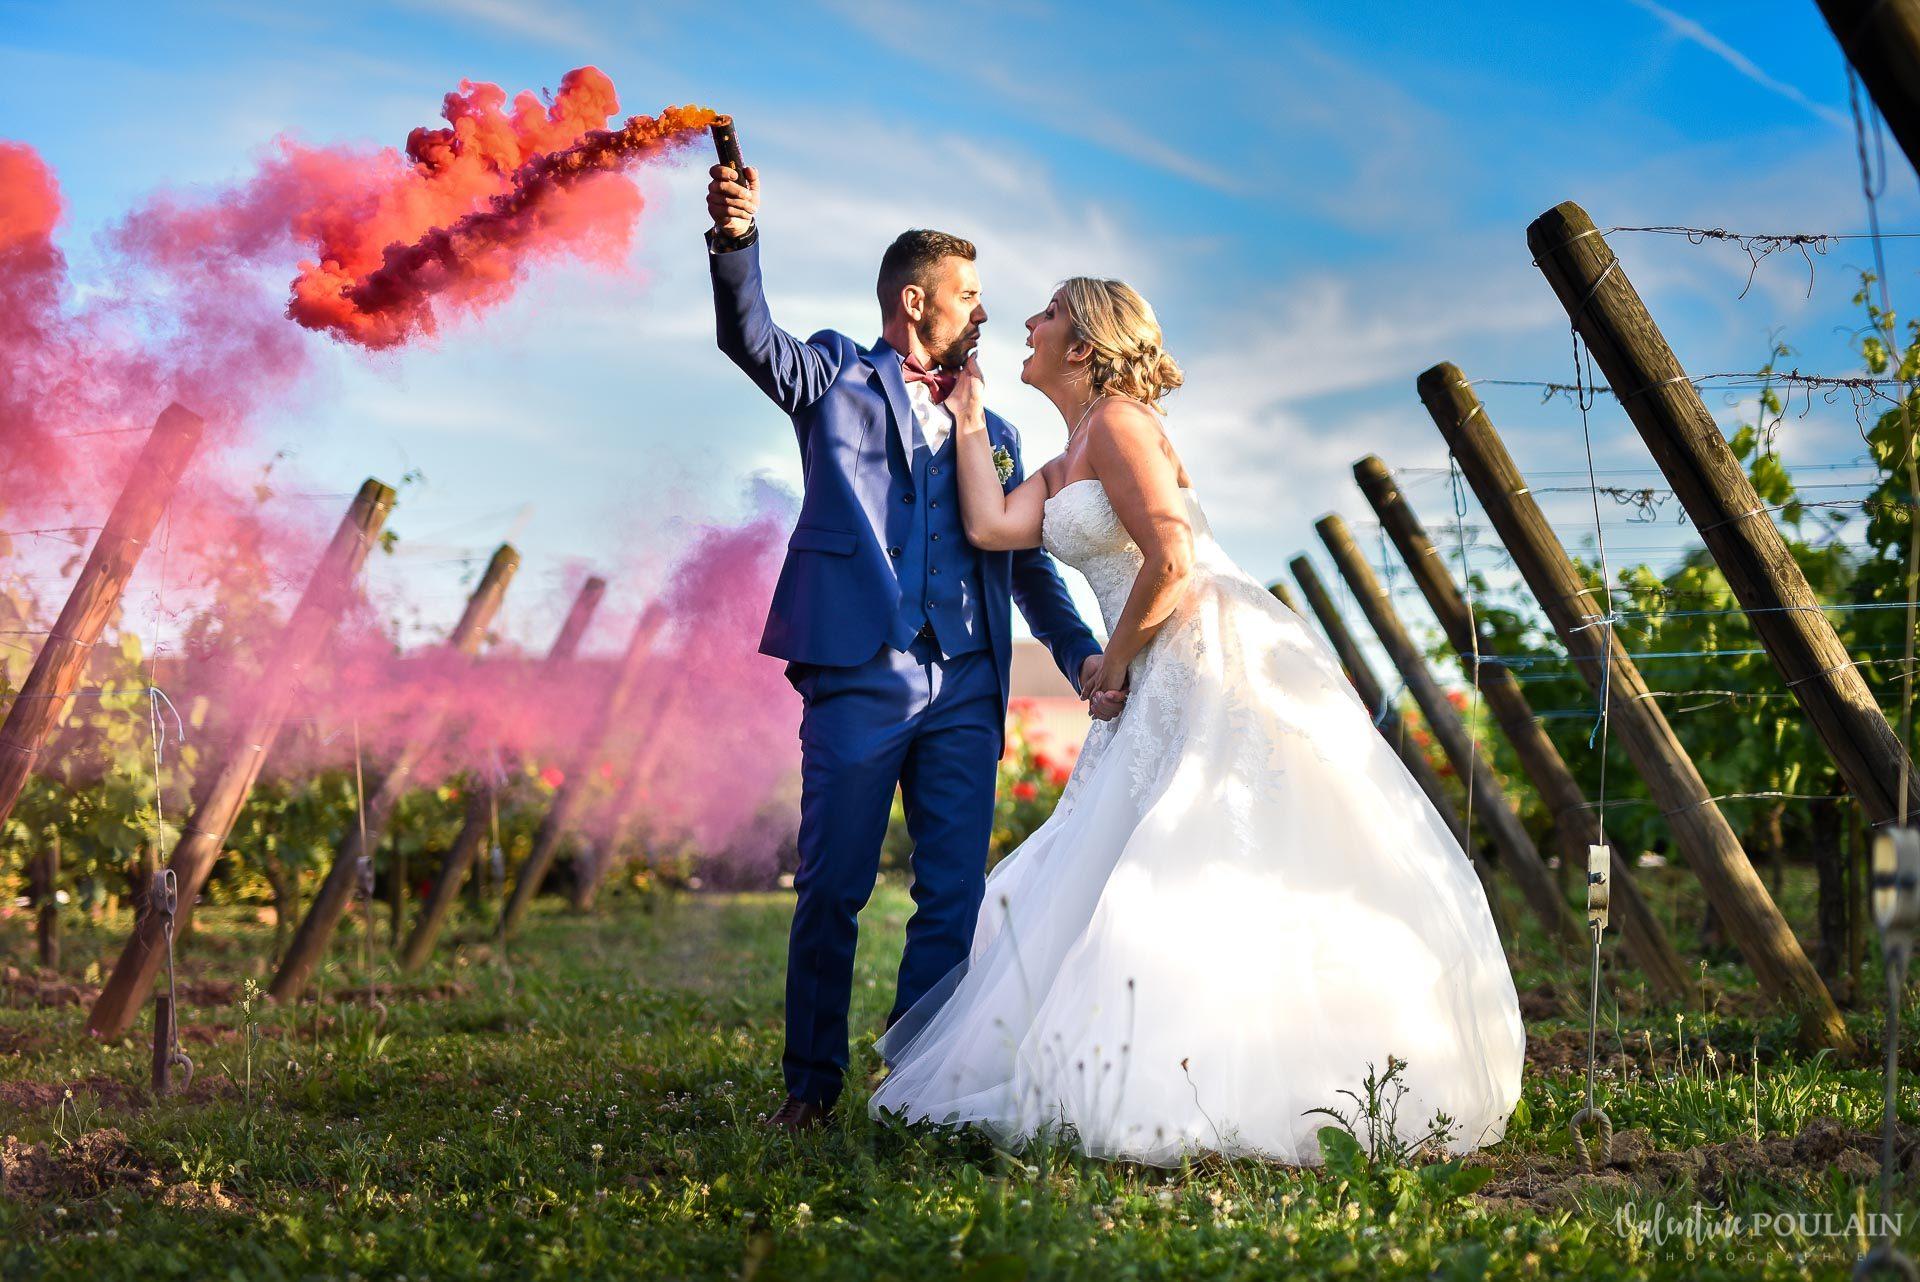 Mariage fun Petit Wettolsheim - Valentine Poulain fumi